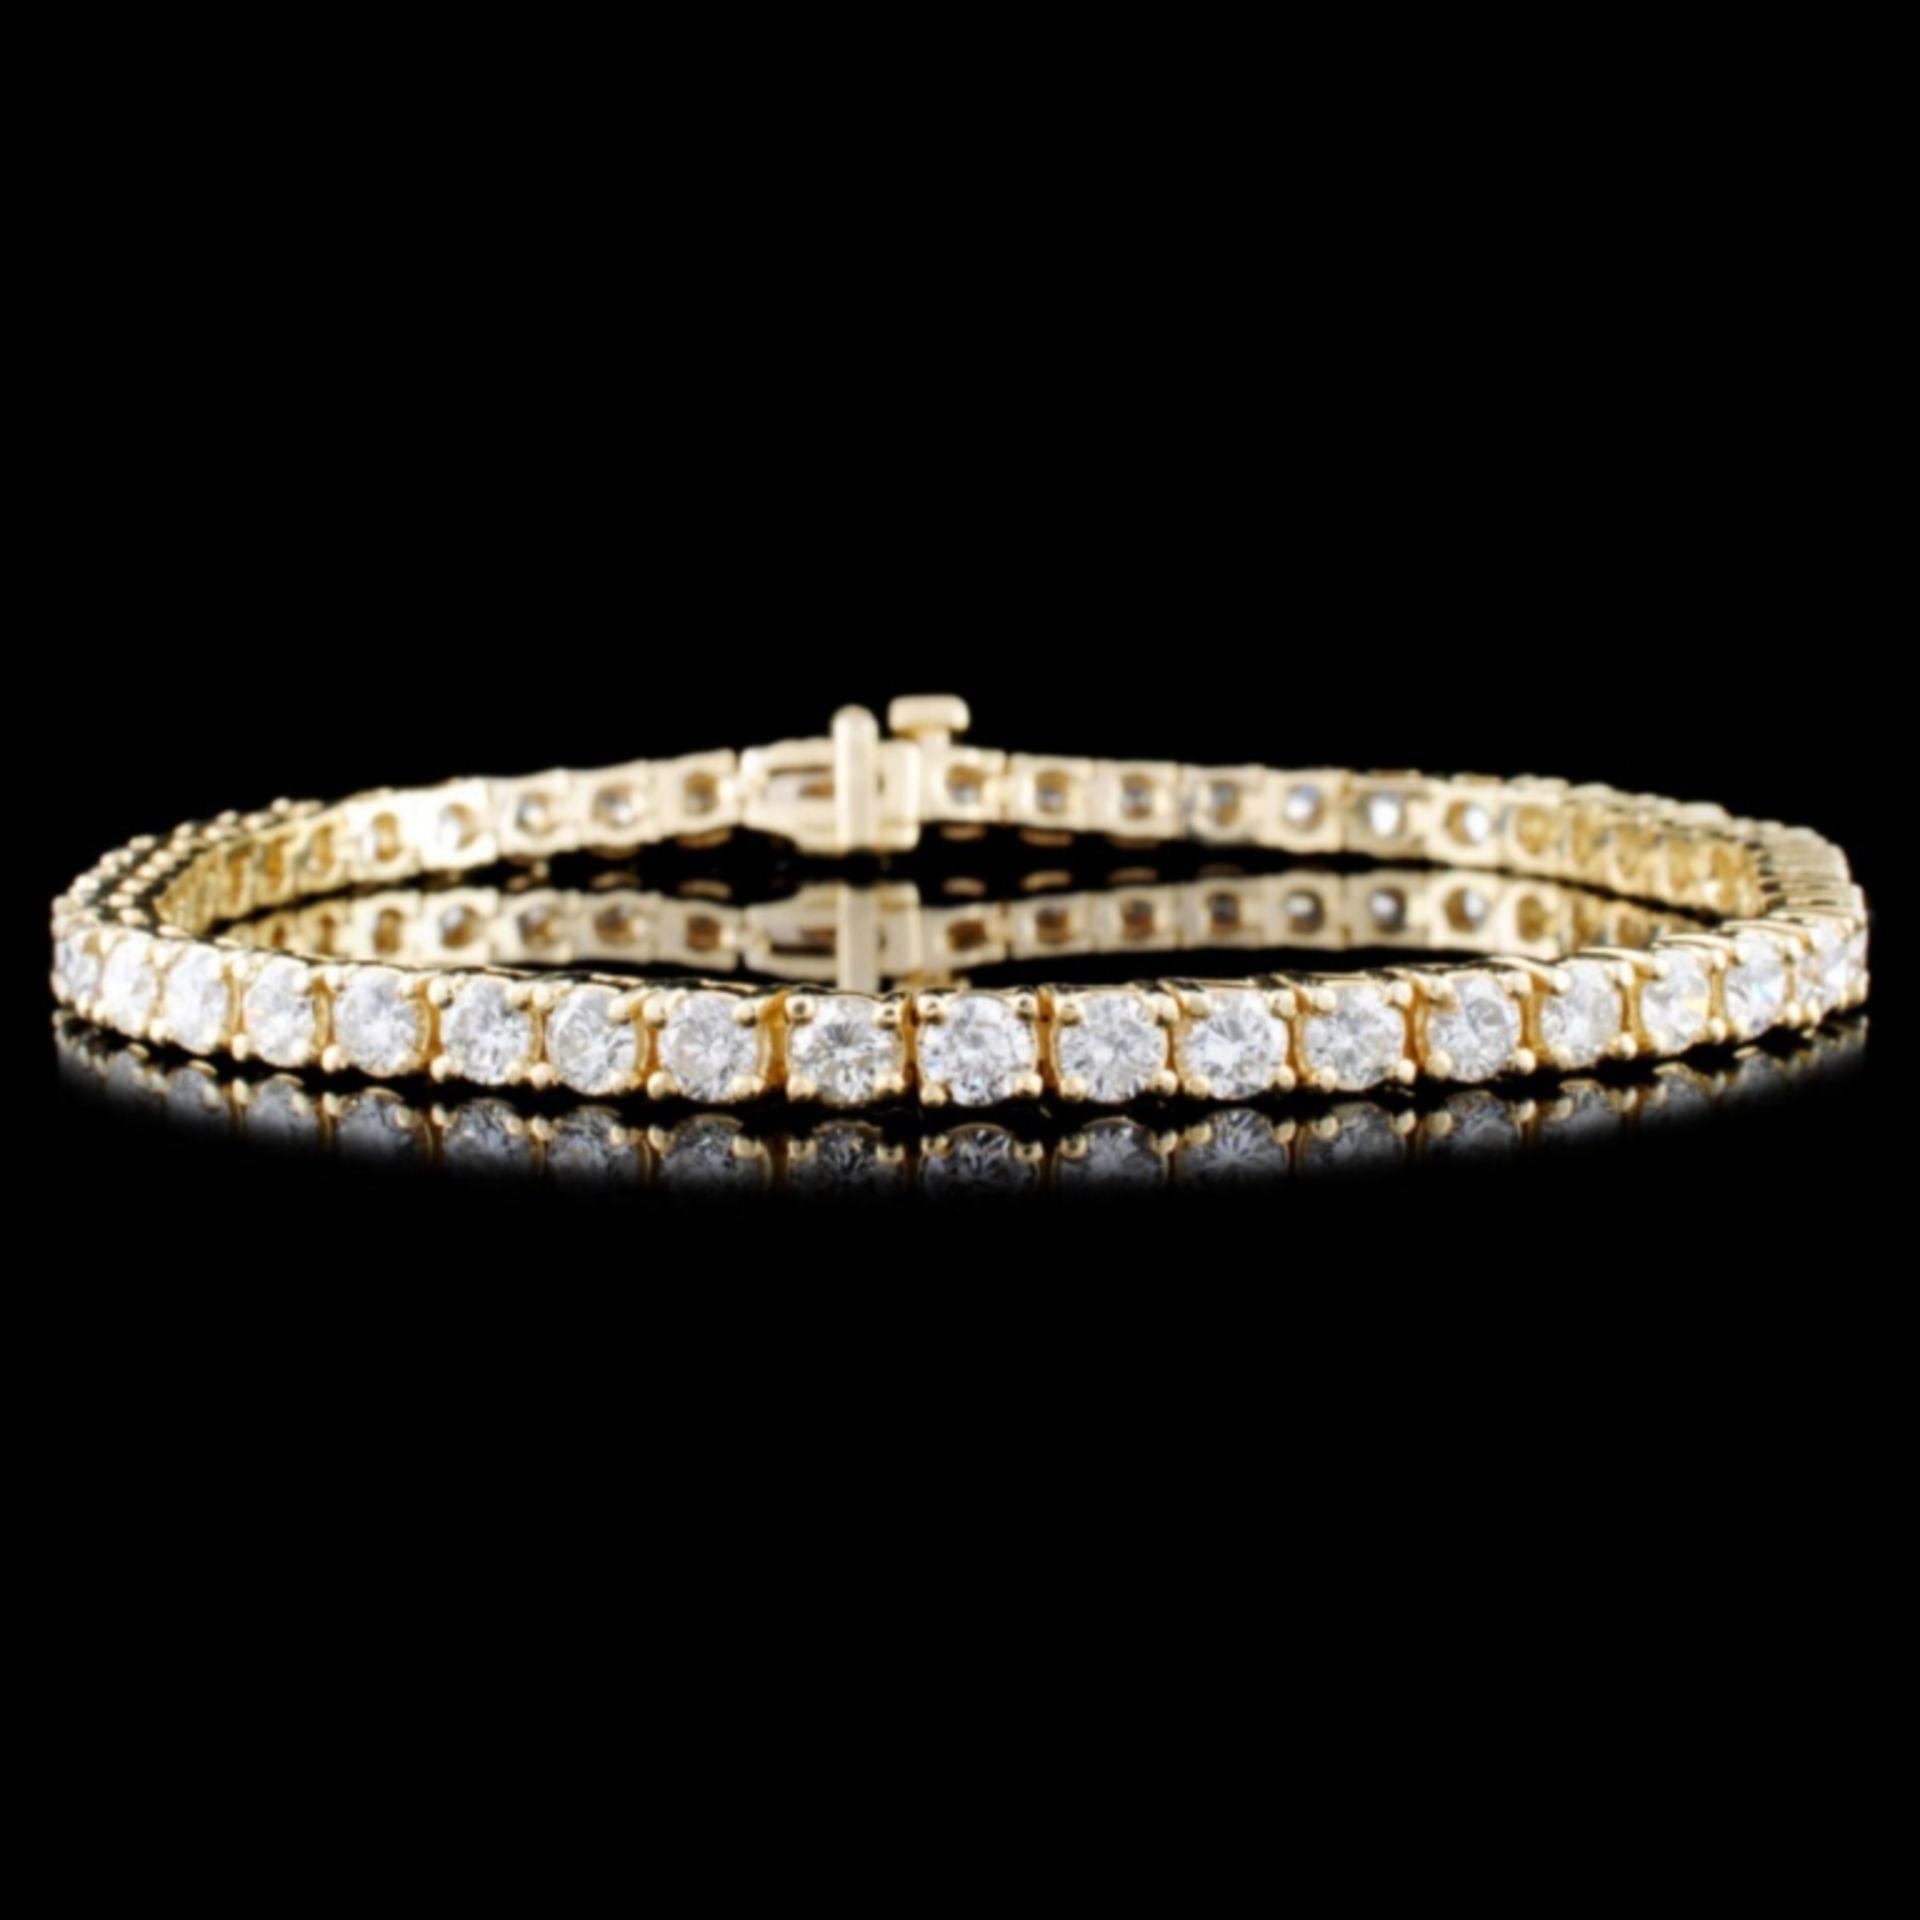 14K Gold 5.16ctw Diamond Bracelet